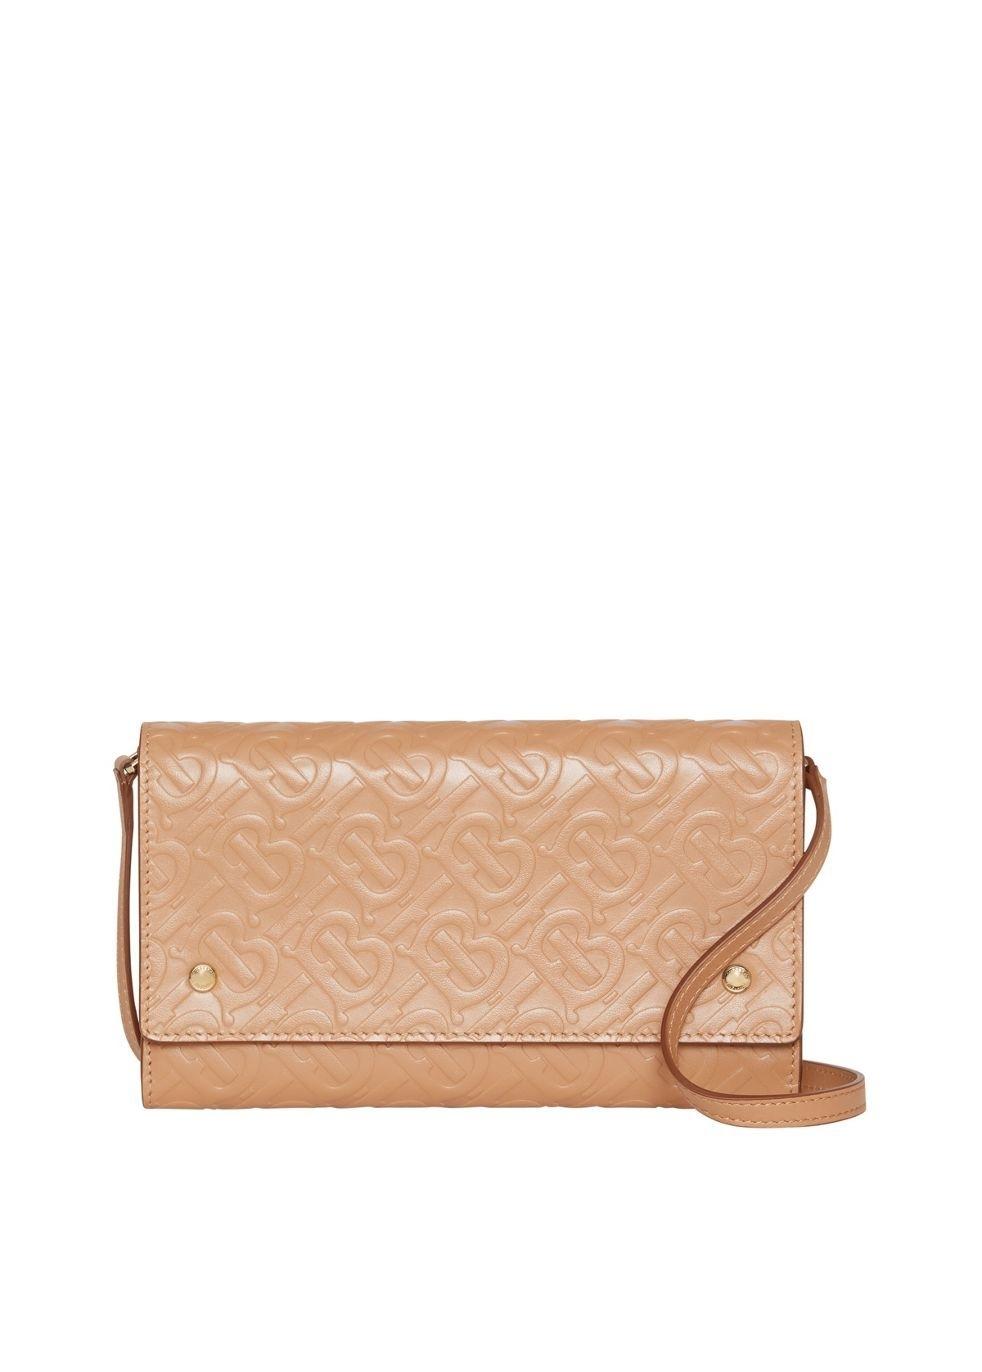 cea2d4b738 Burberry Bags - Womens - Harvey Nichols